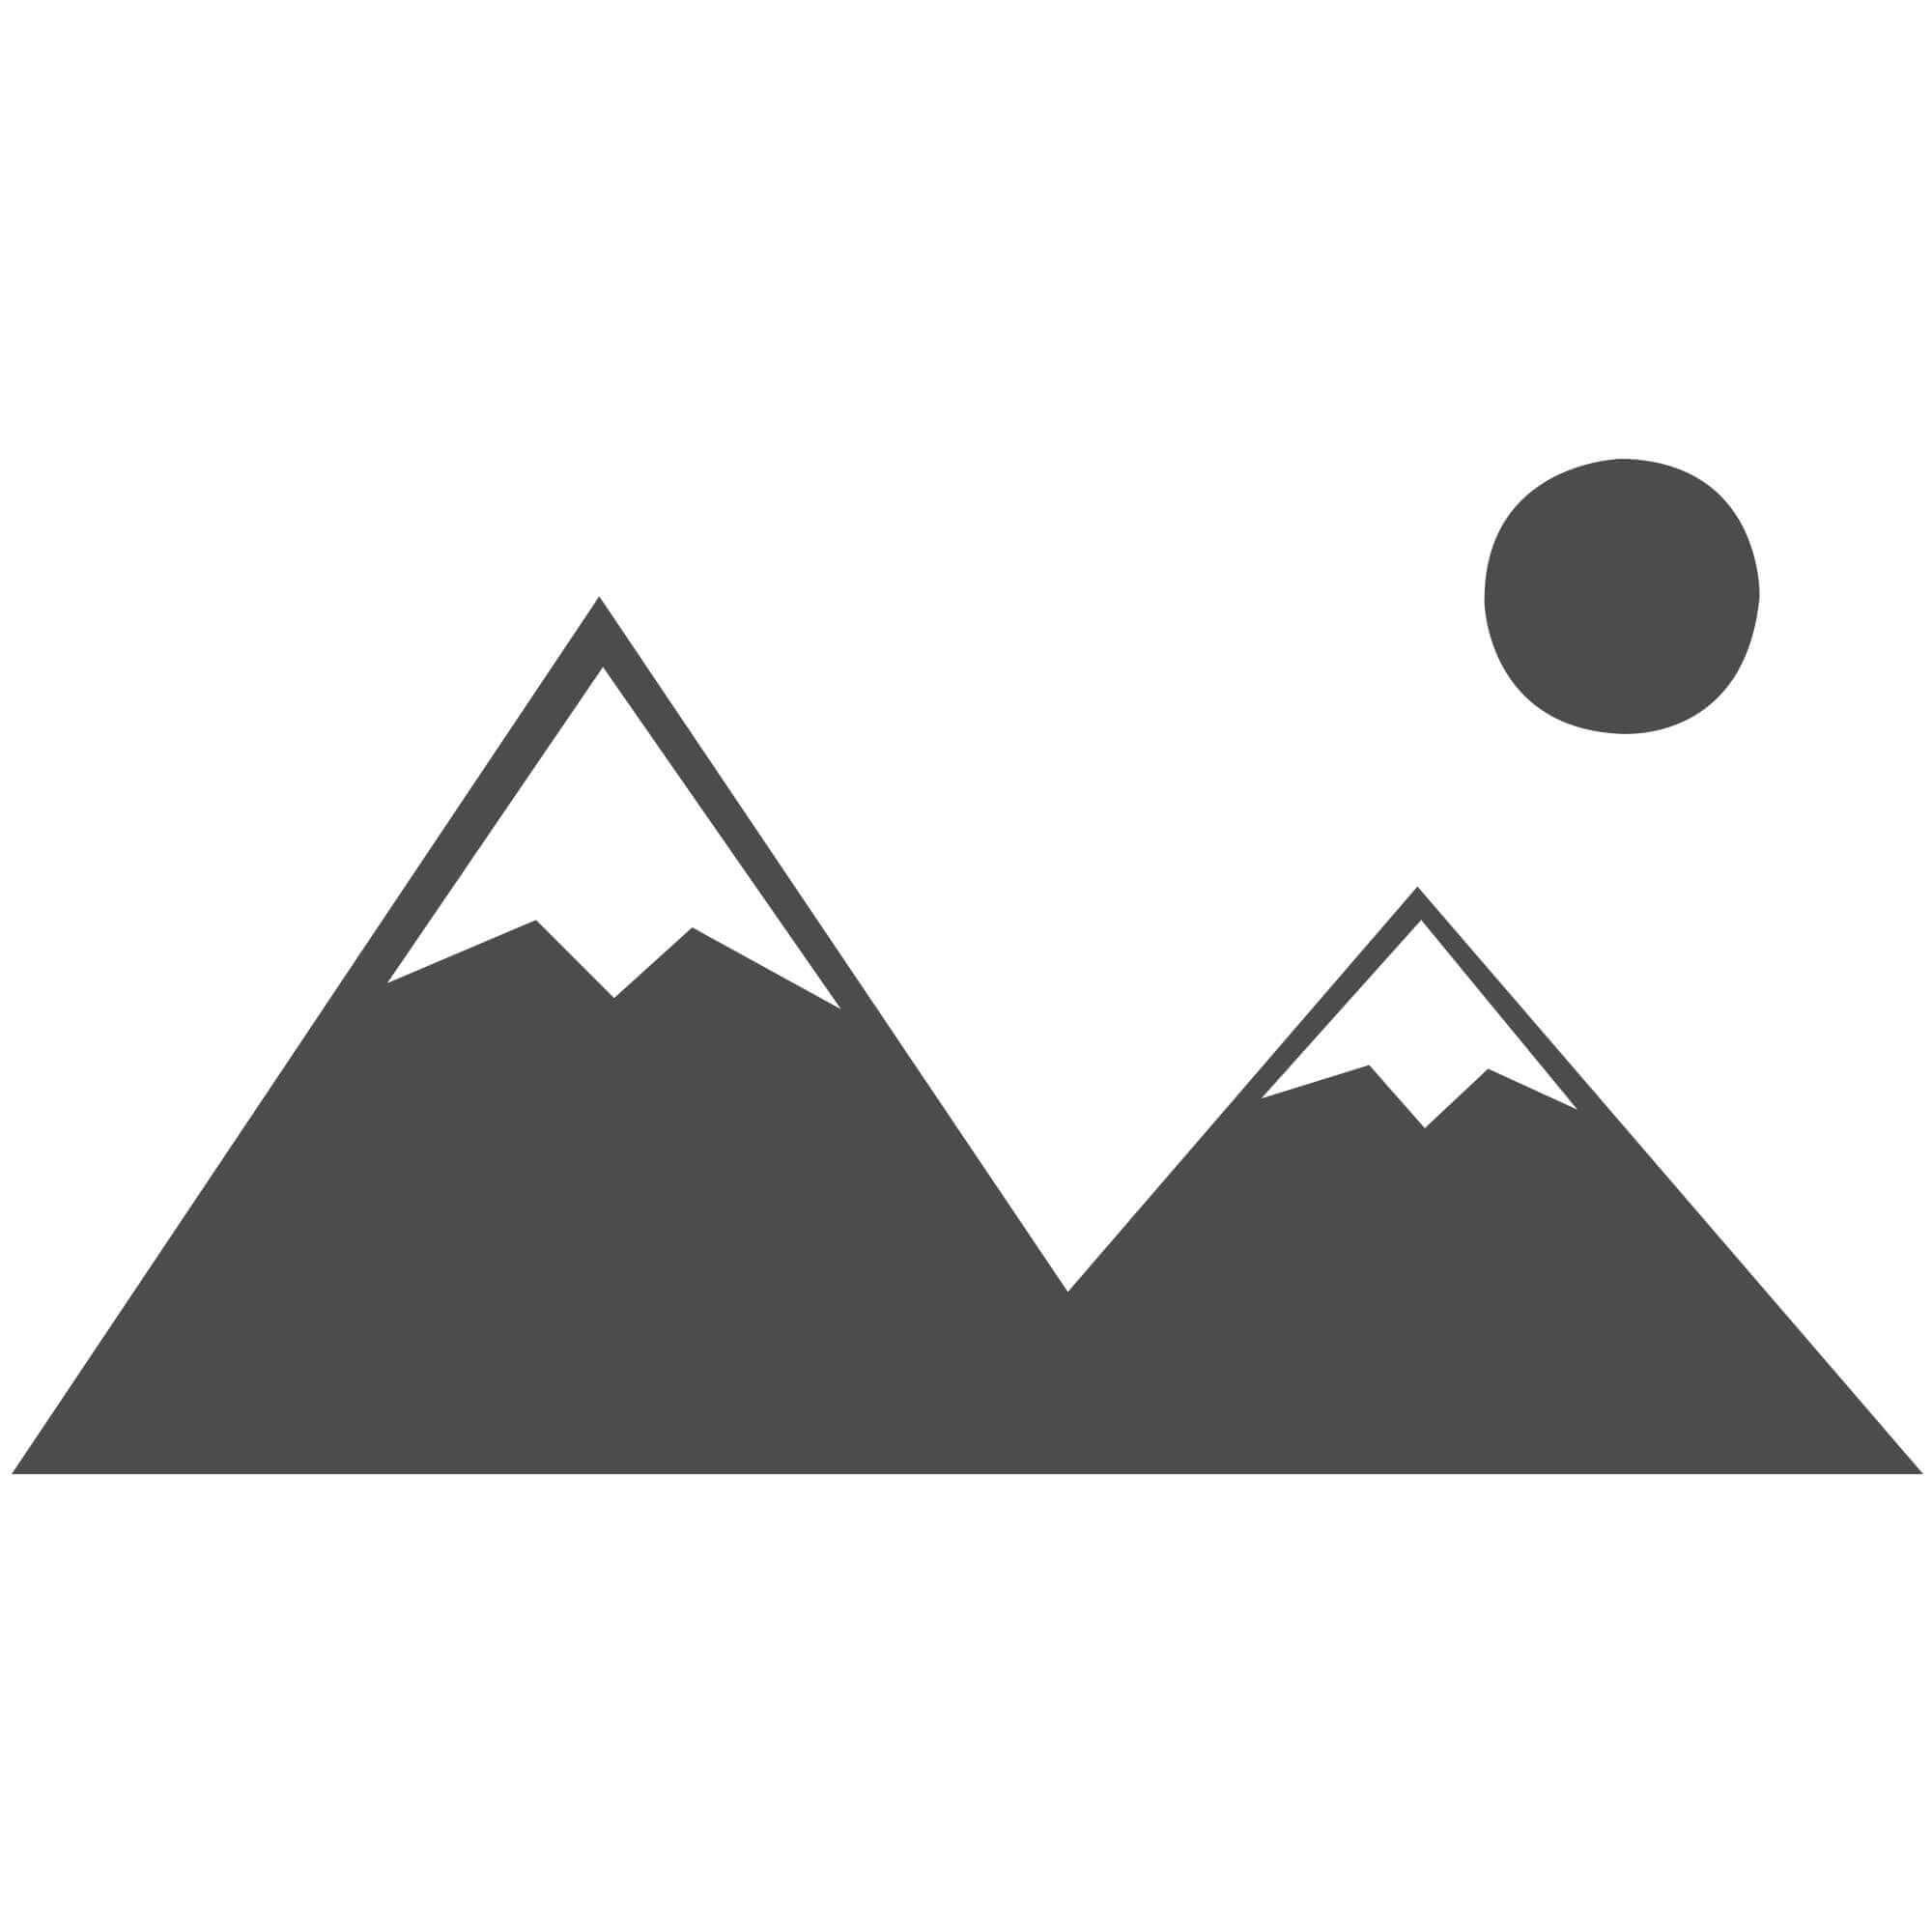 Nordic Cariboo Shaggy Rug - Black - Size Runner 60 x 230 cm